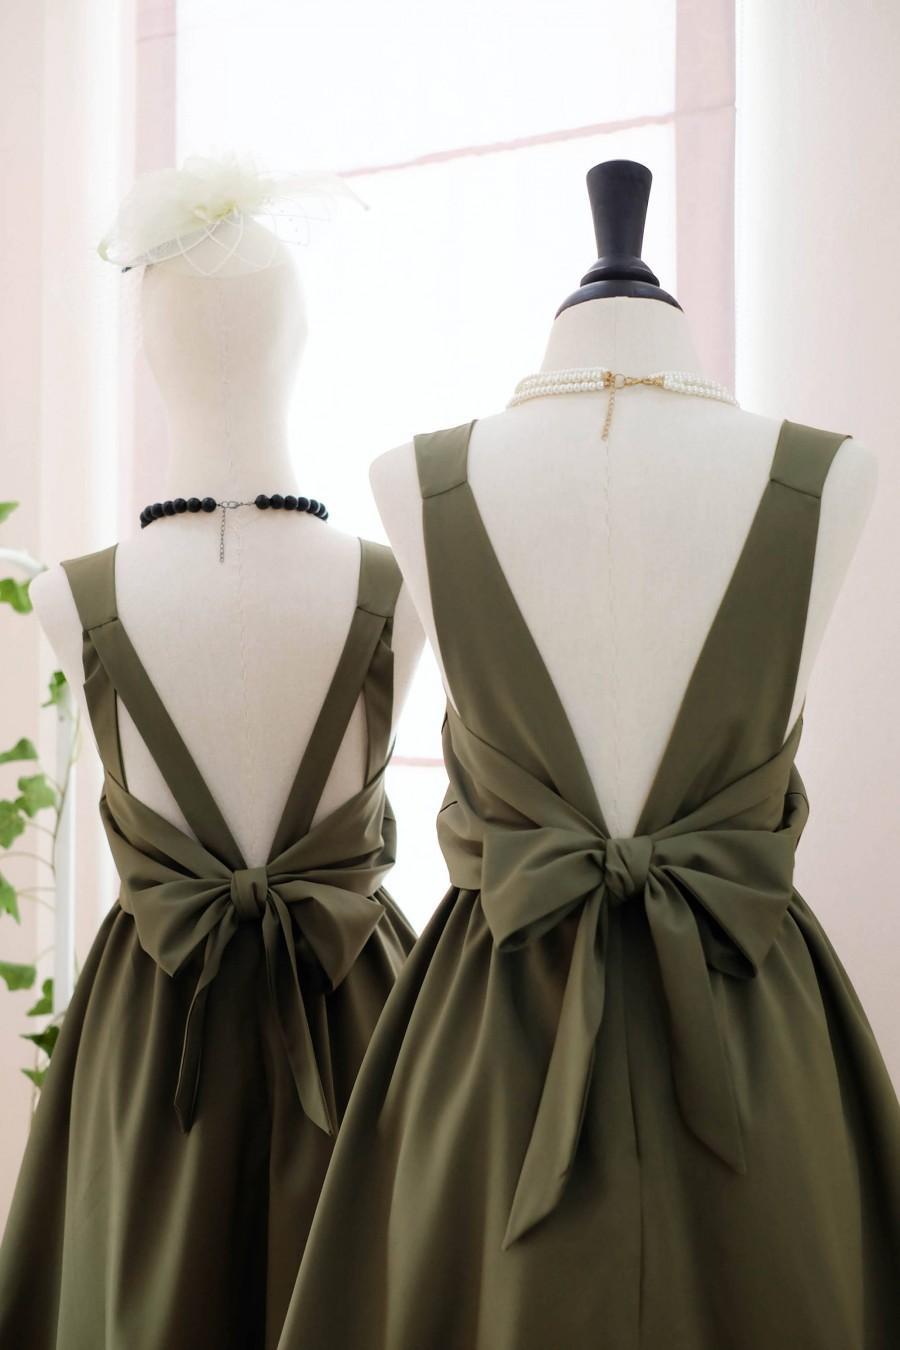 زفاف - Olive Green dress Dark green Bridesmaid dress Wedding Prom dress Cocktail Party dress Evening dress Backless bow dress